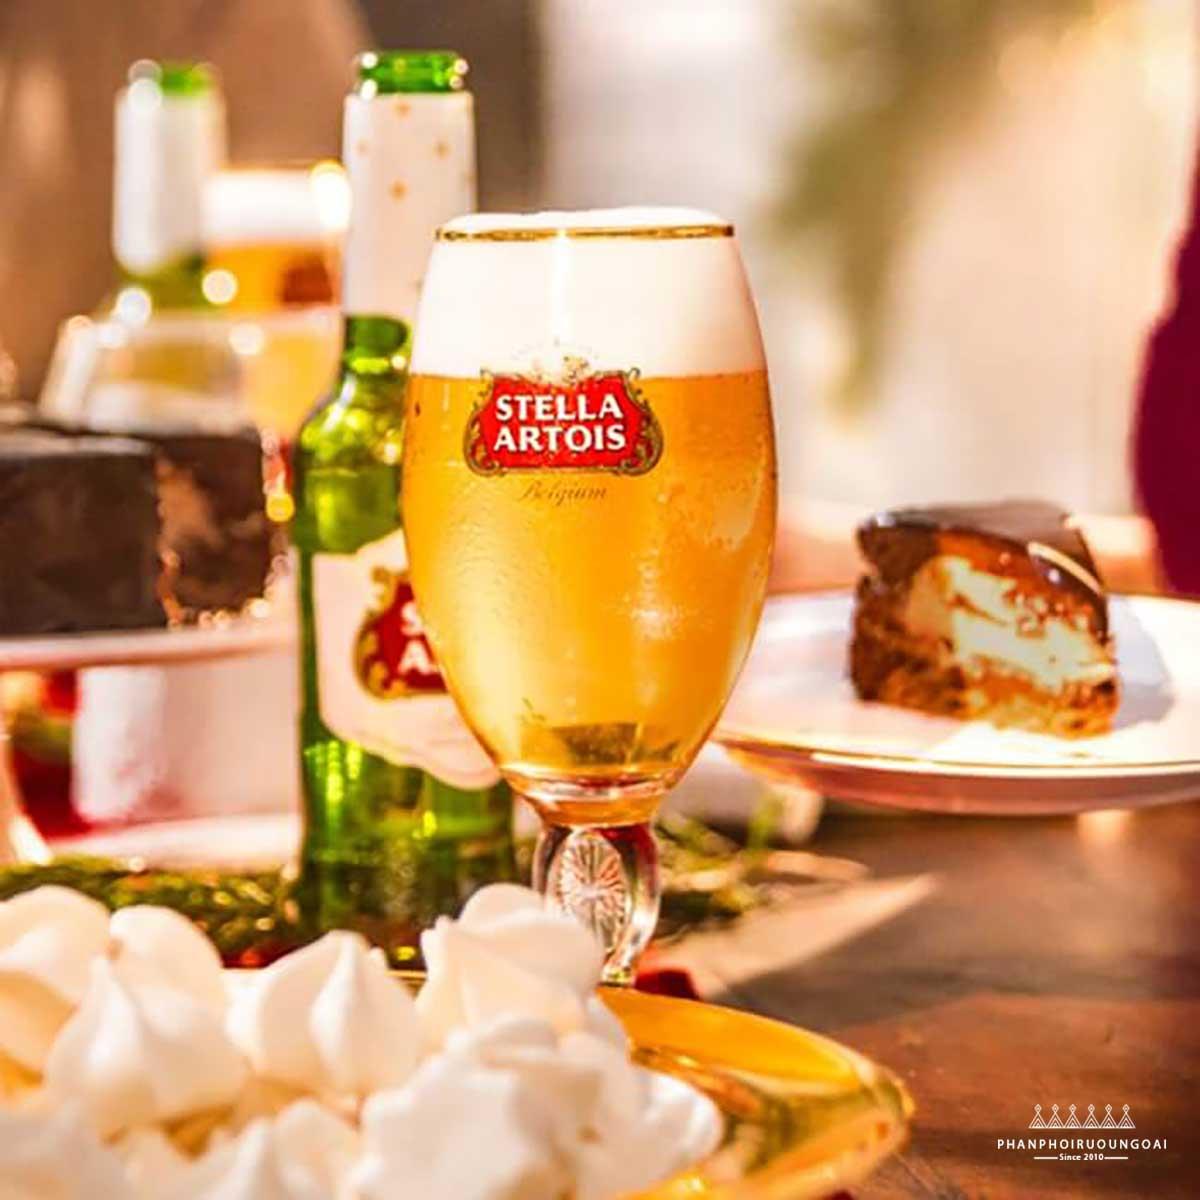 Bàn tiệc với bia Stella Artois